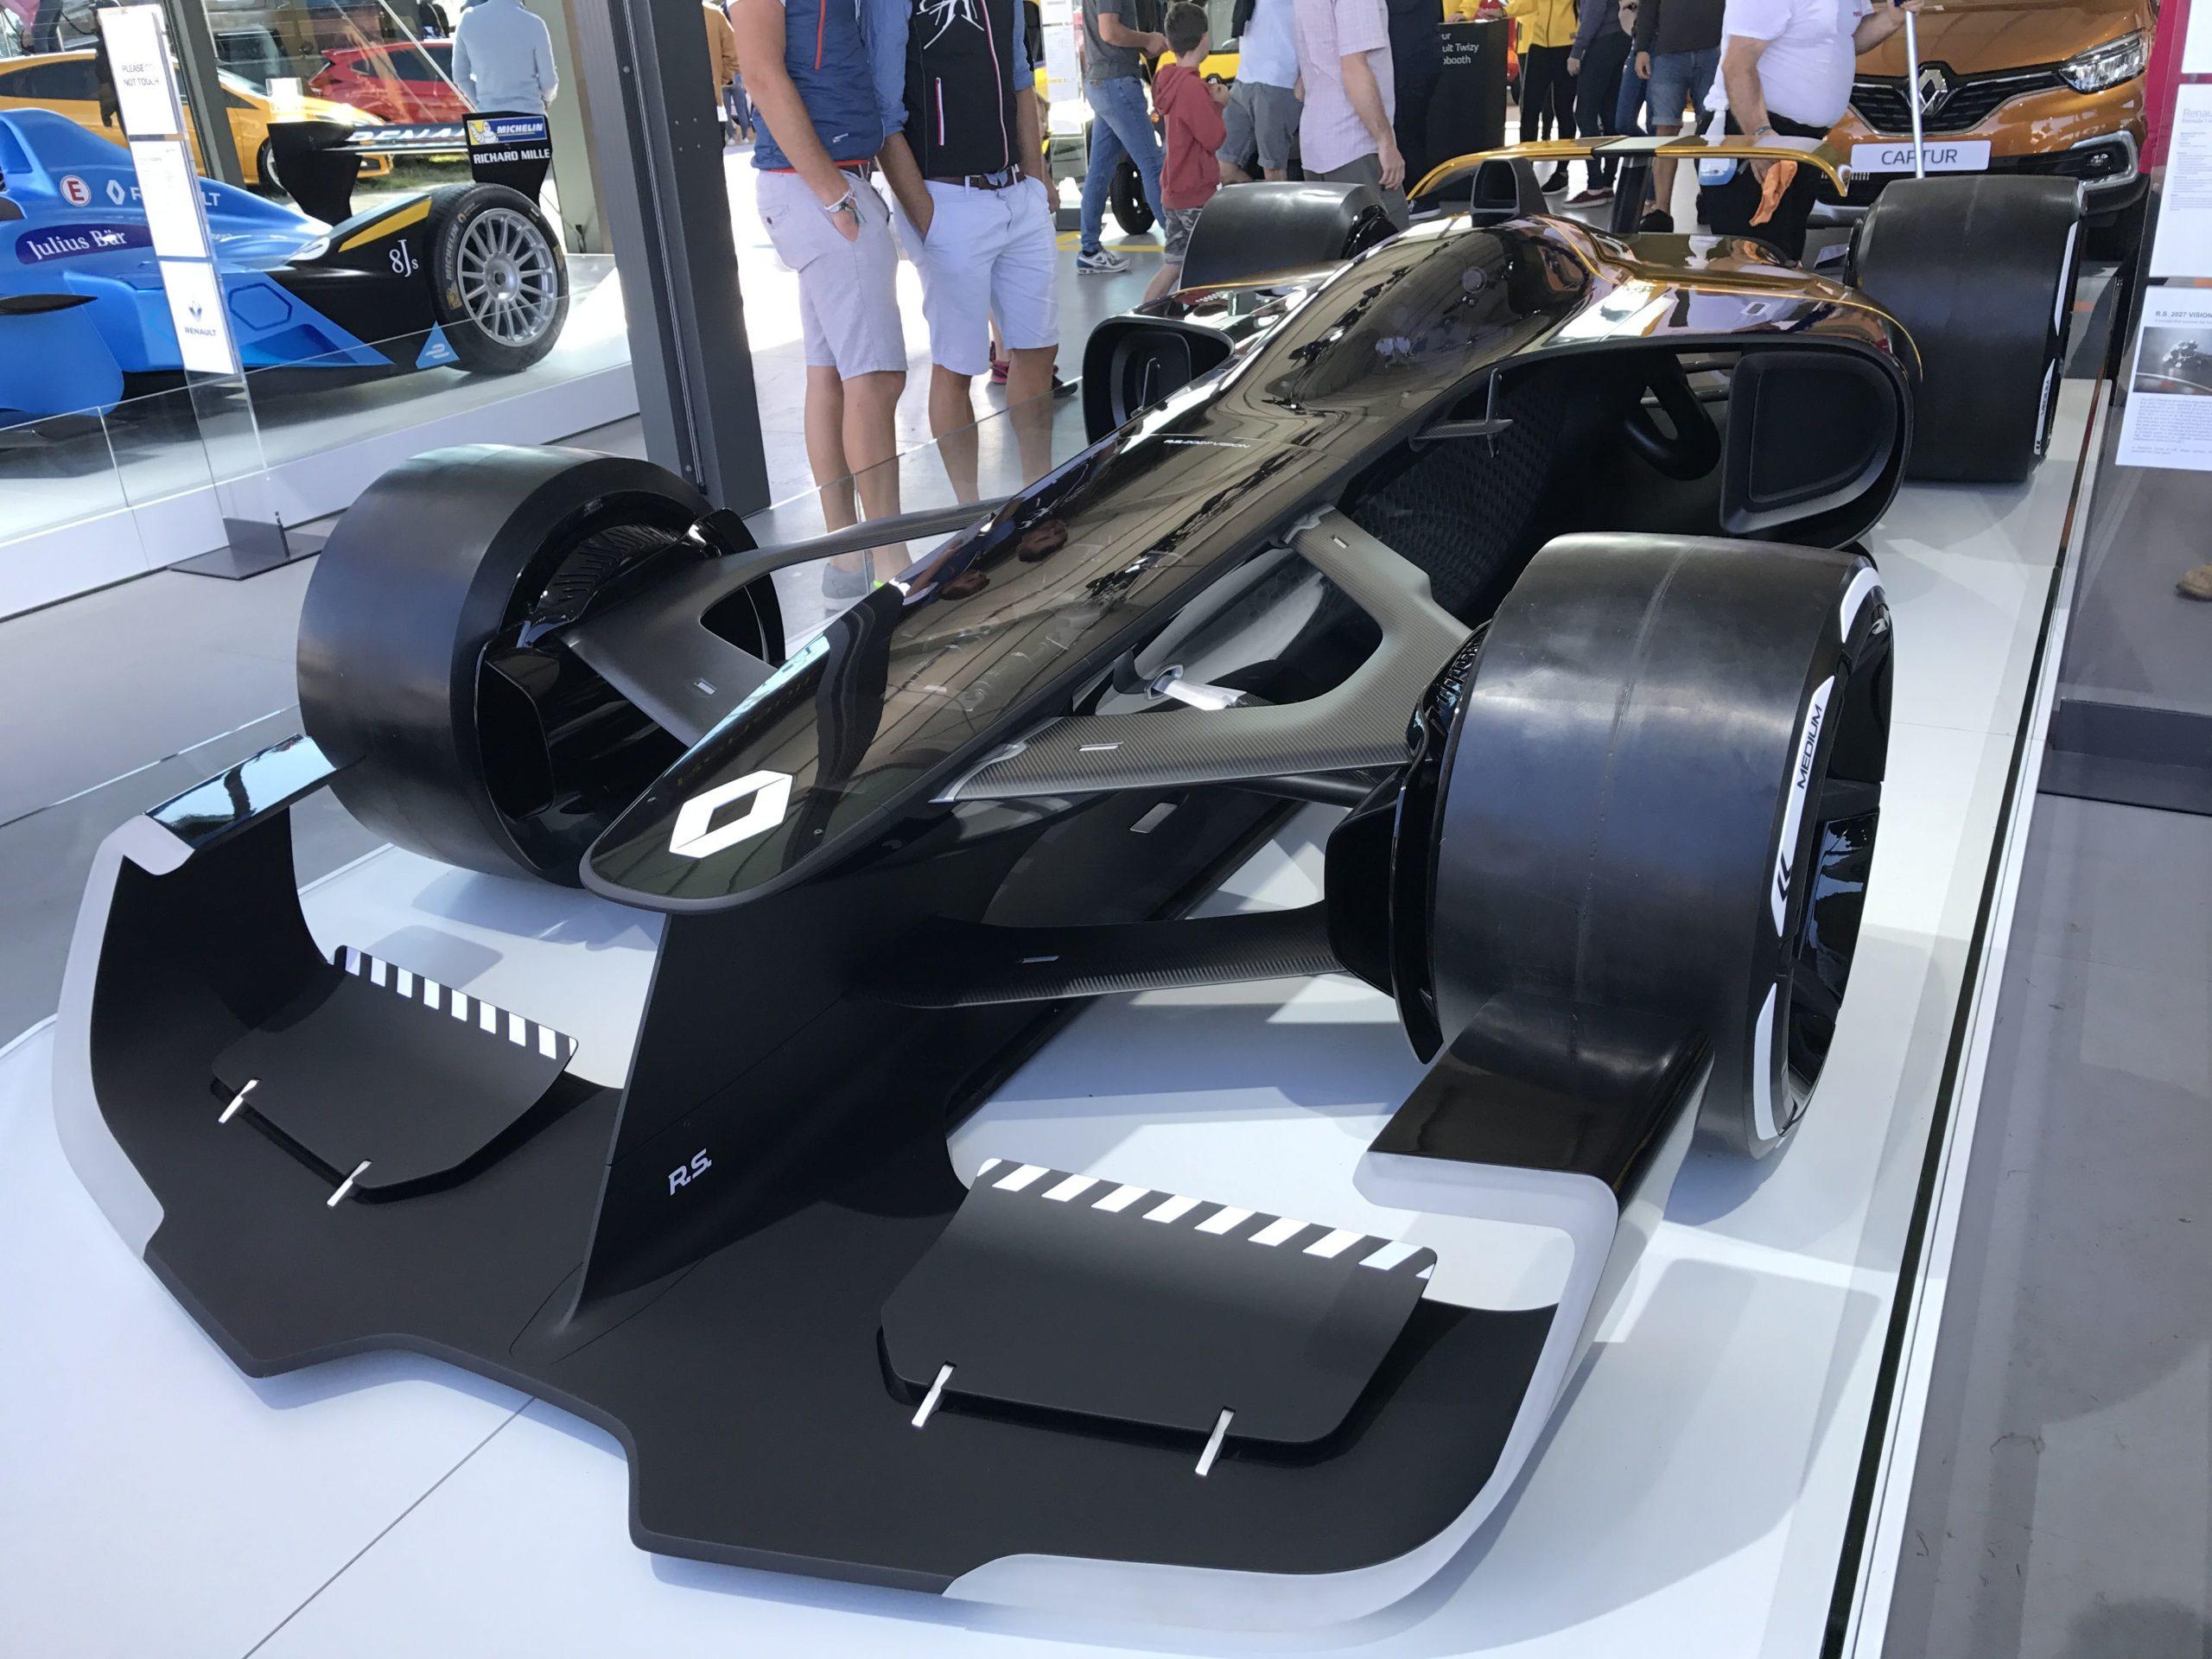 Renault concept racing car (seen at Goodwood FOS) – Andy Pidgeon